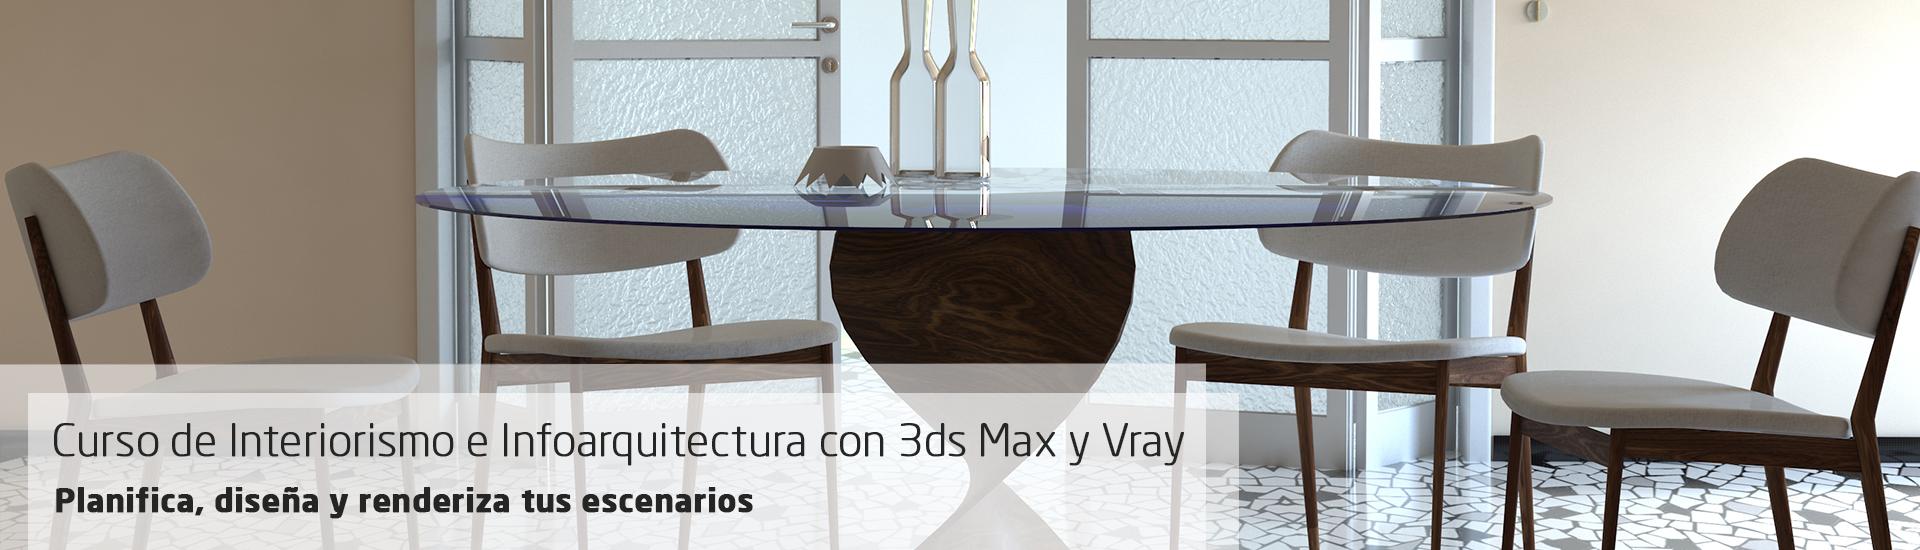 Curso online de interiorismo e infoarquitectura 3d studio for Programas 3d interiorismo